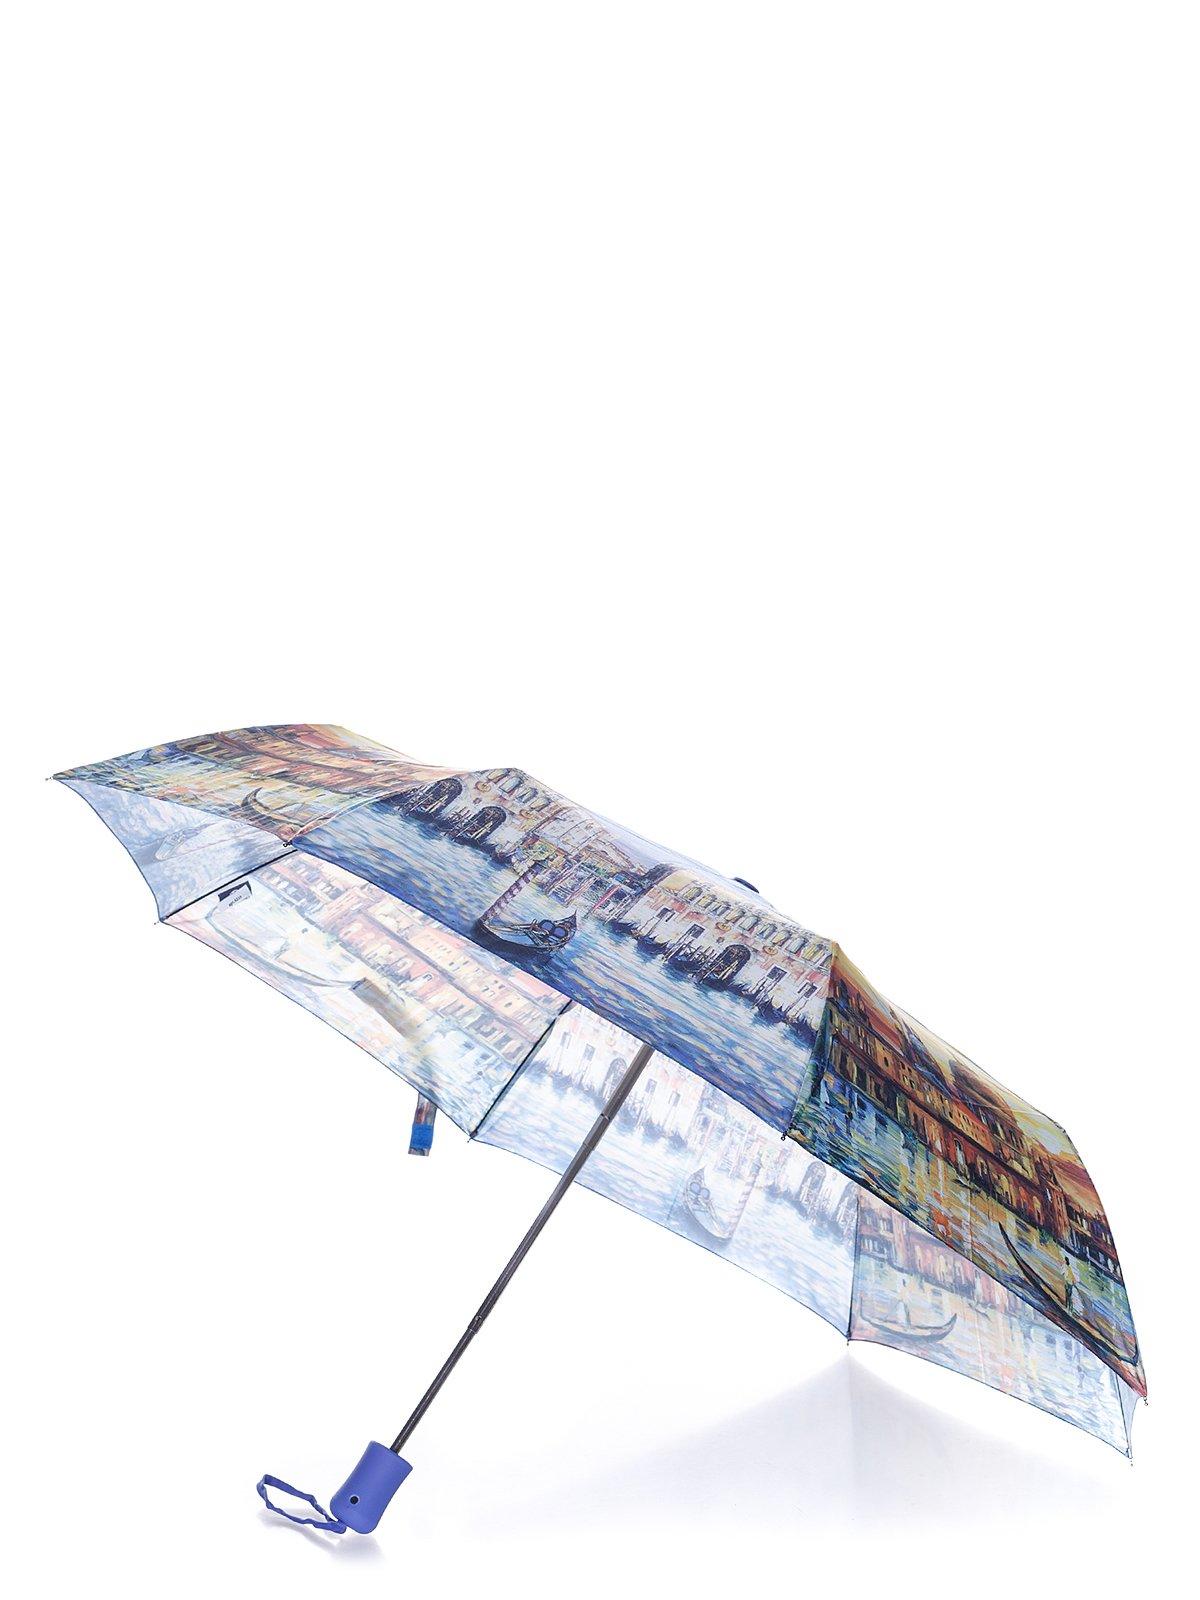 Зонт полу-автомат | 3754581 | фото 2